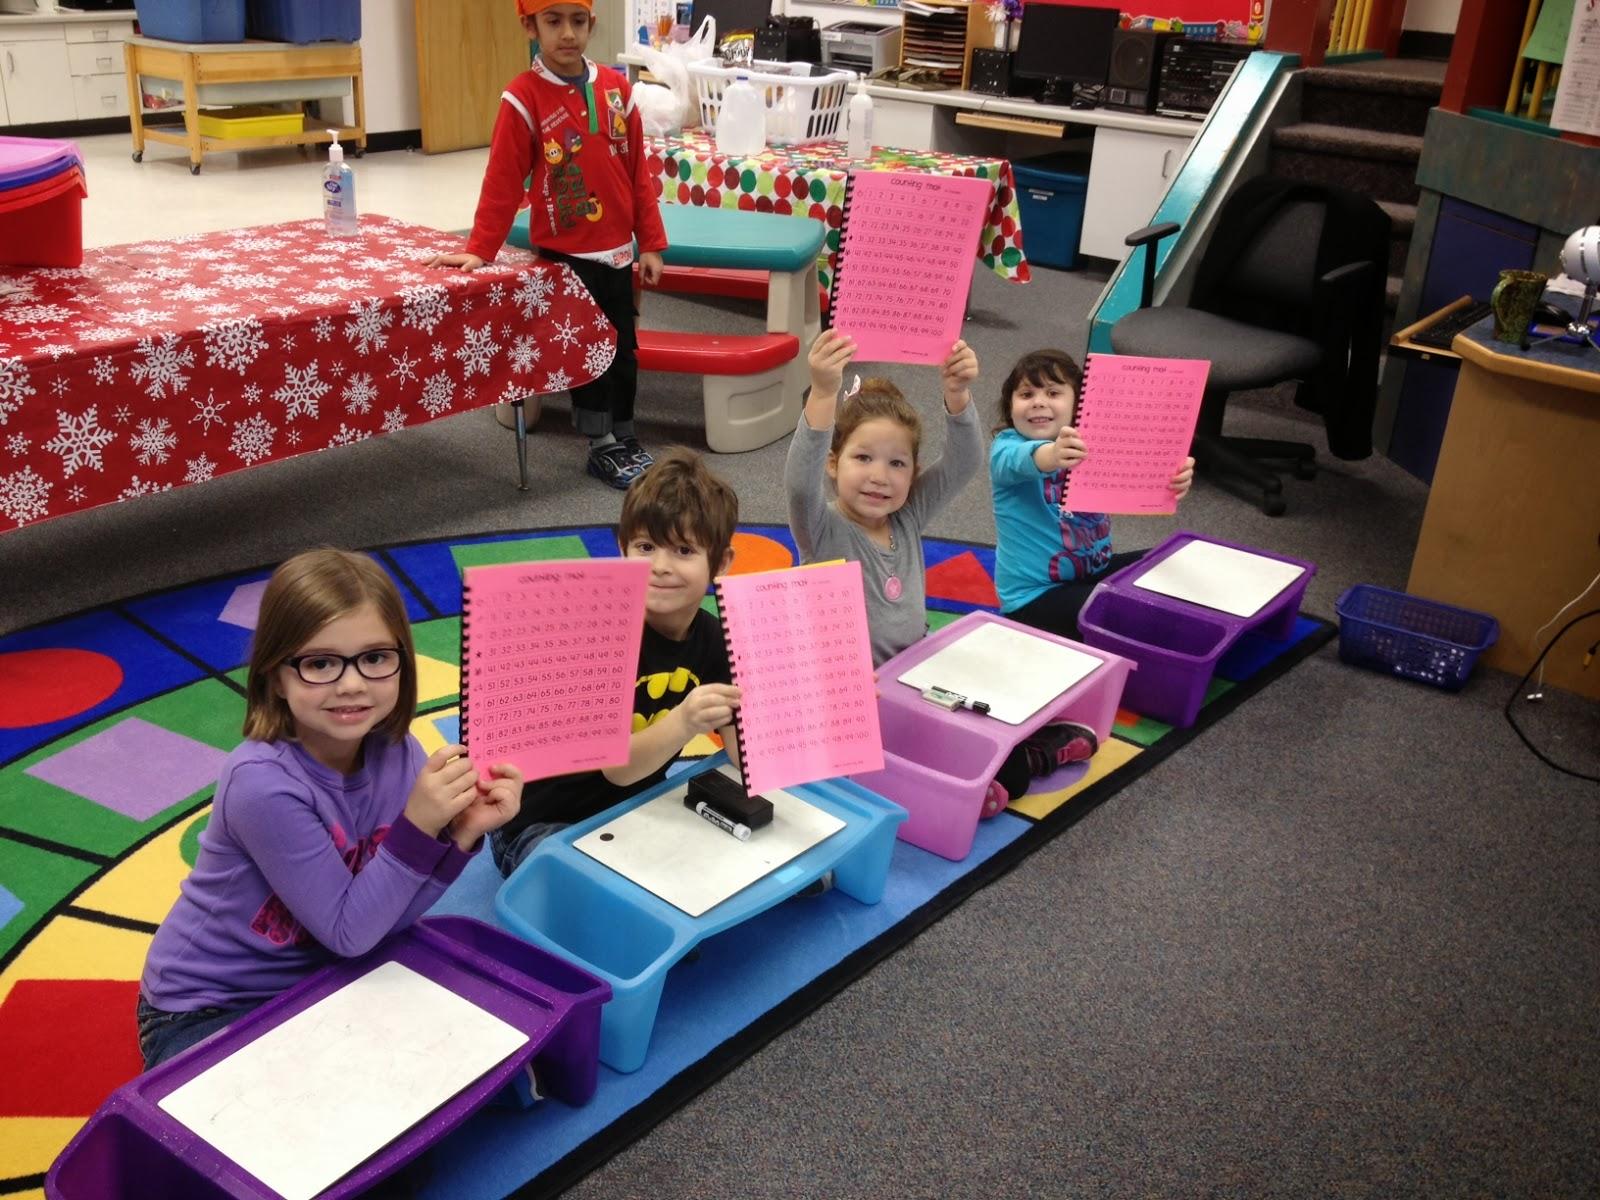 Kindergarten Calendar Interactive Whiteboard : Kindergarten diva making your morning calendar truly